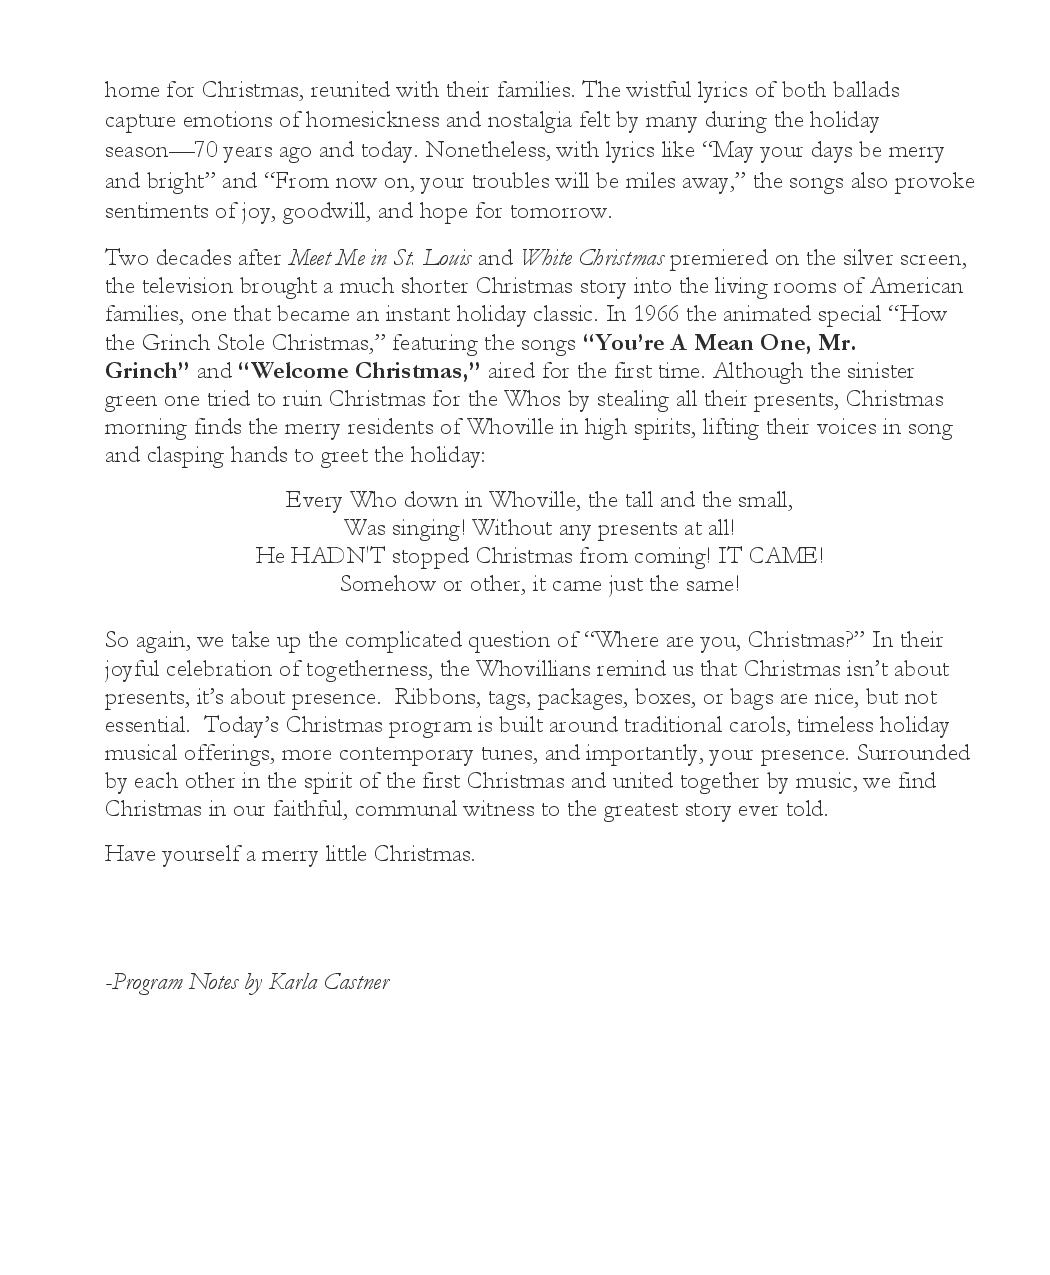 ChristmasProgram_14DEC18-FINAL-REV3-page-005.jpg